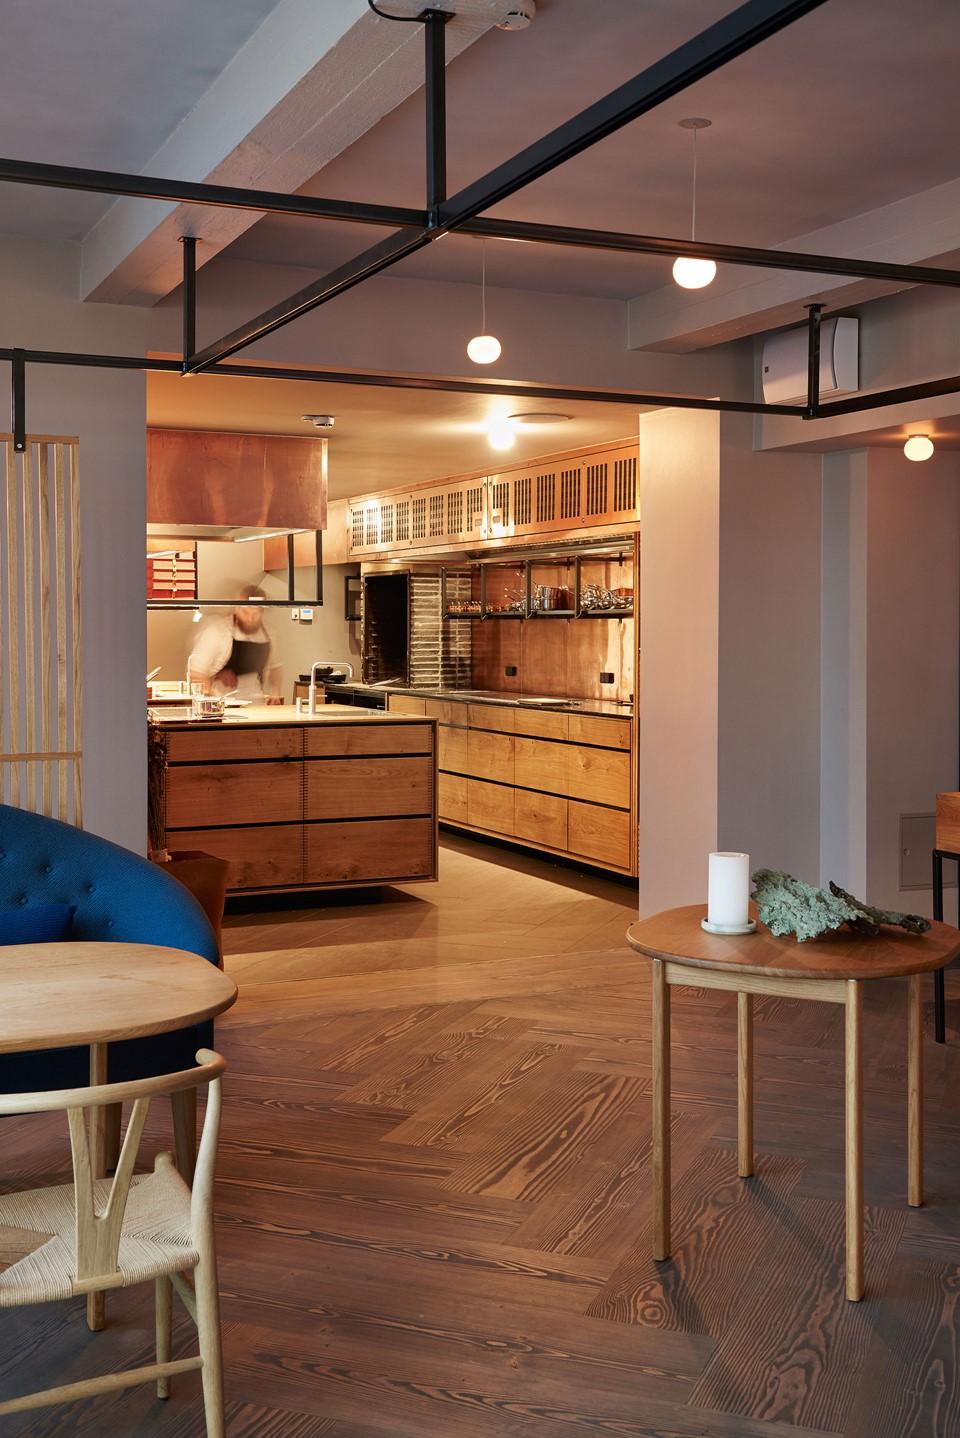 herringbone-douglas-dark-flooring_antracite-grey-oil_kadeau-restaurant-copenhagen_dining_dinesen_03.jpg